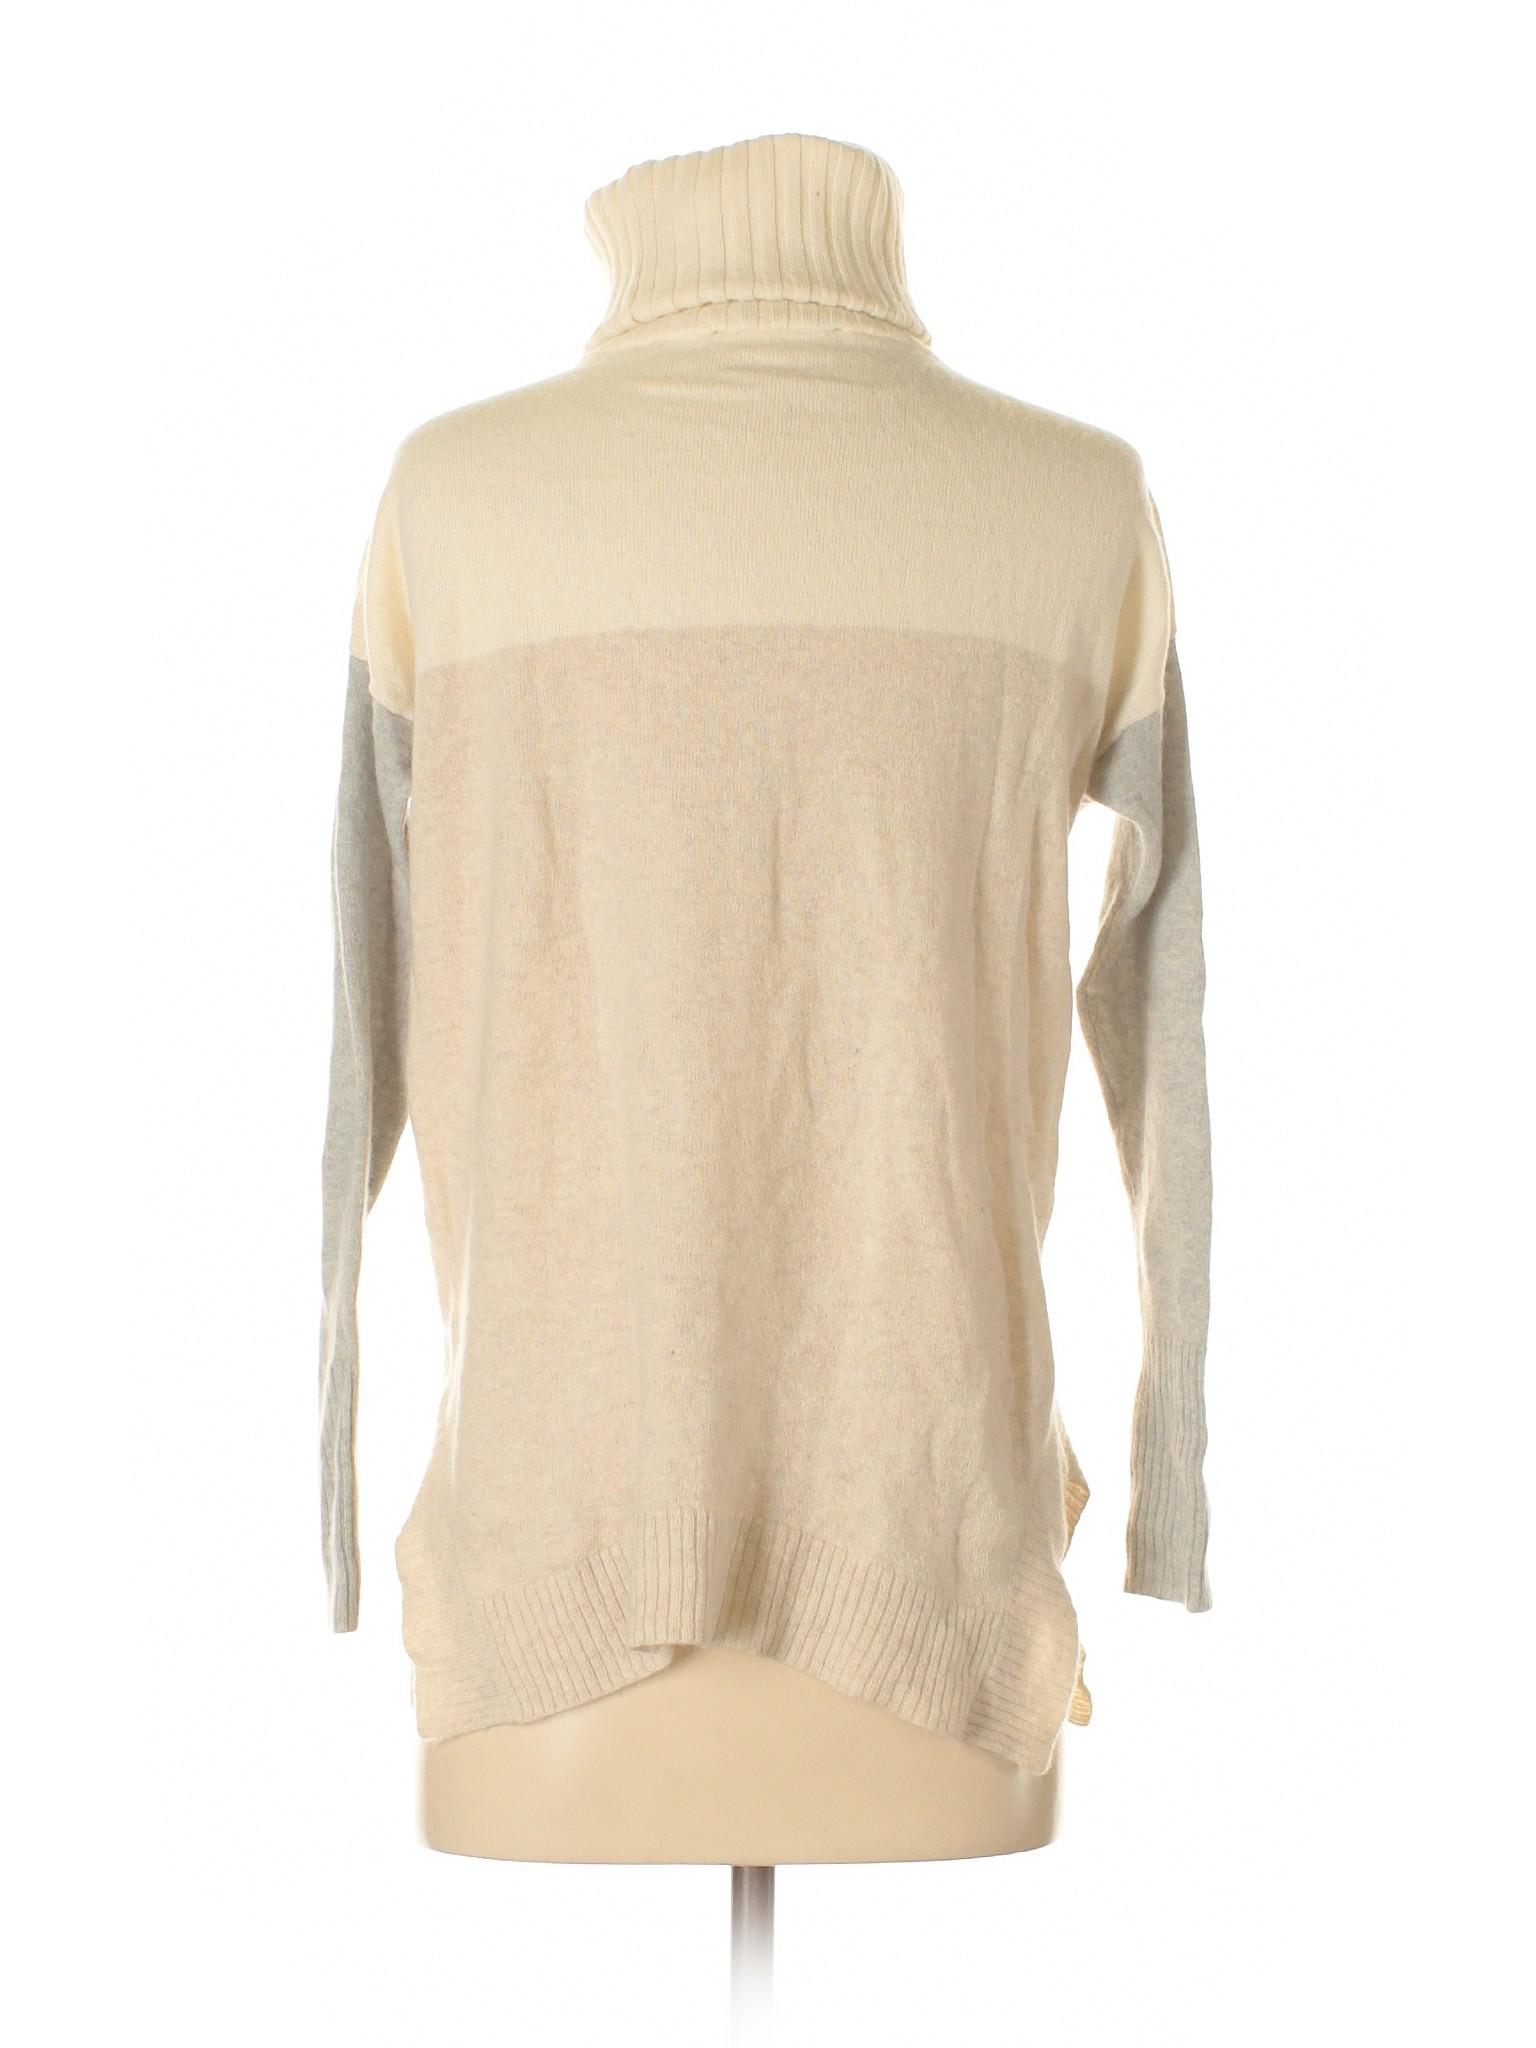 Boutique Sweater winter Cashmere Pullover Taylor Ann qnw7qr4zT